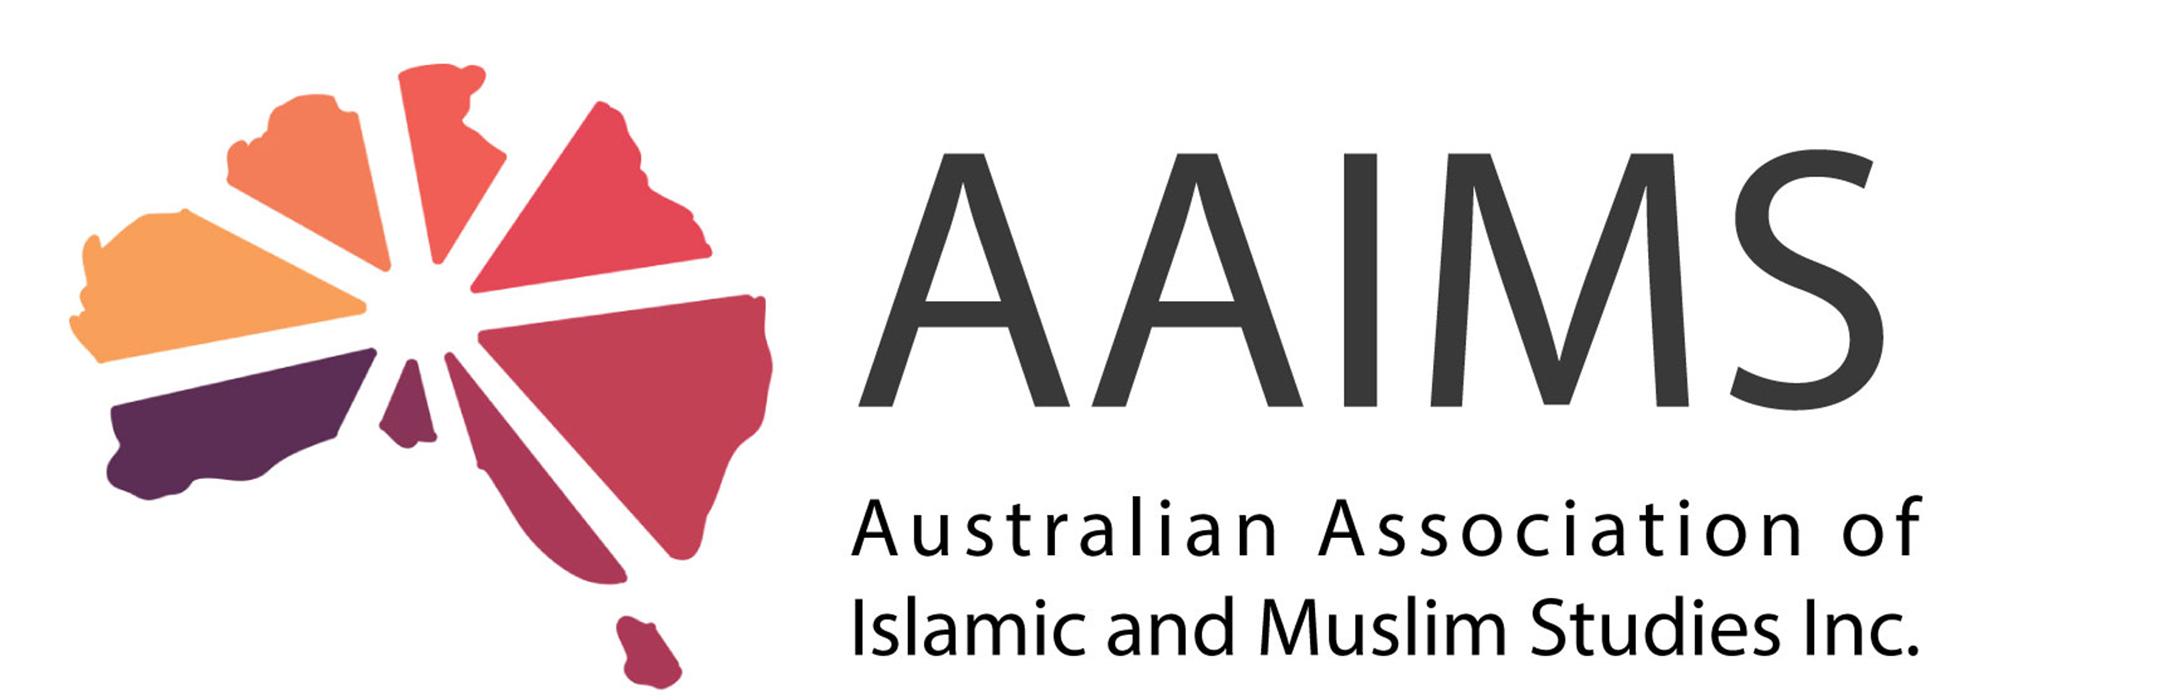 AAIMS logo2